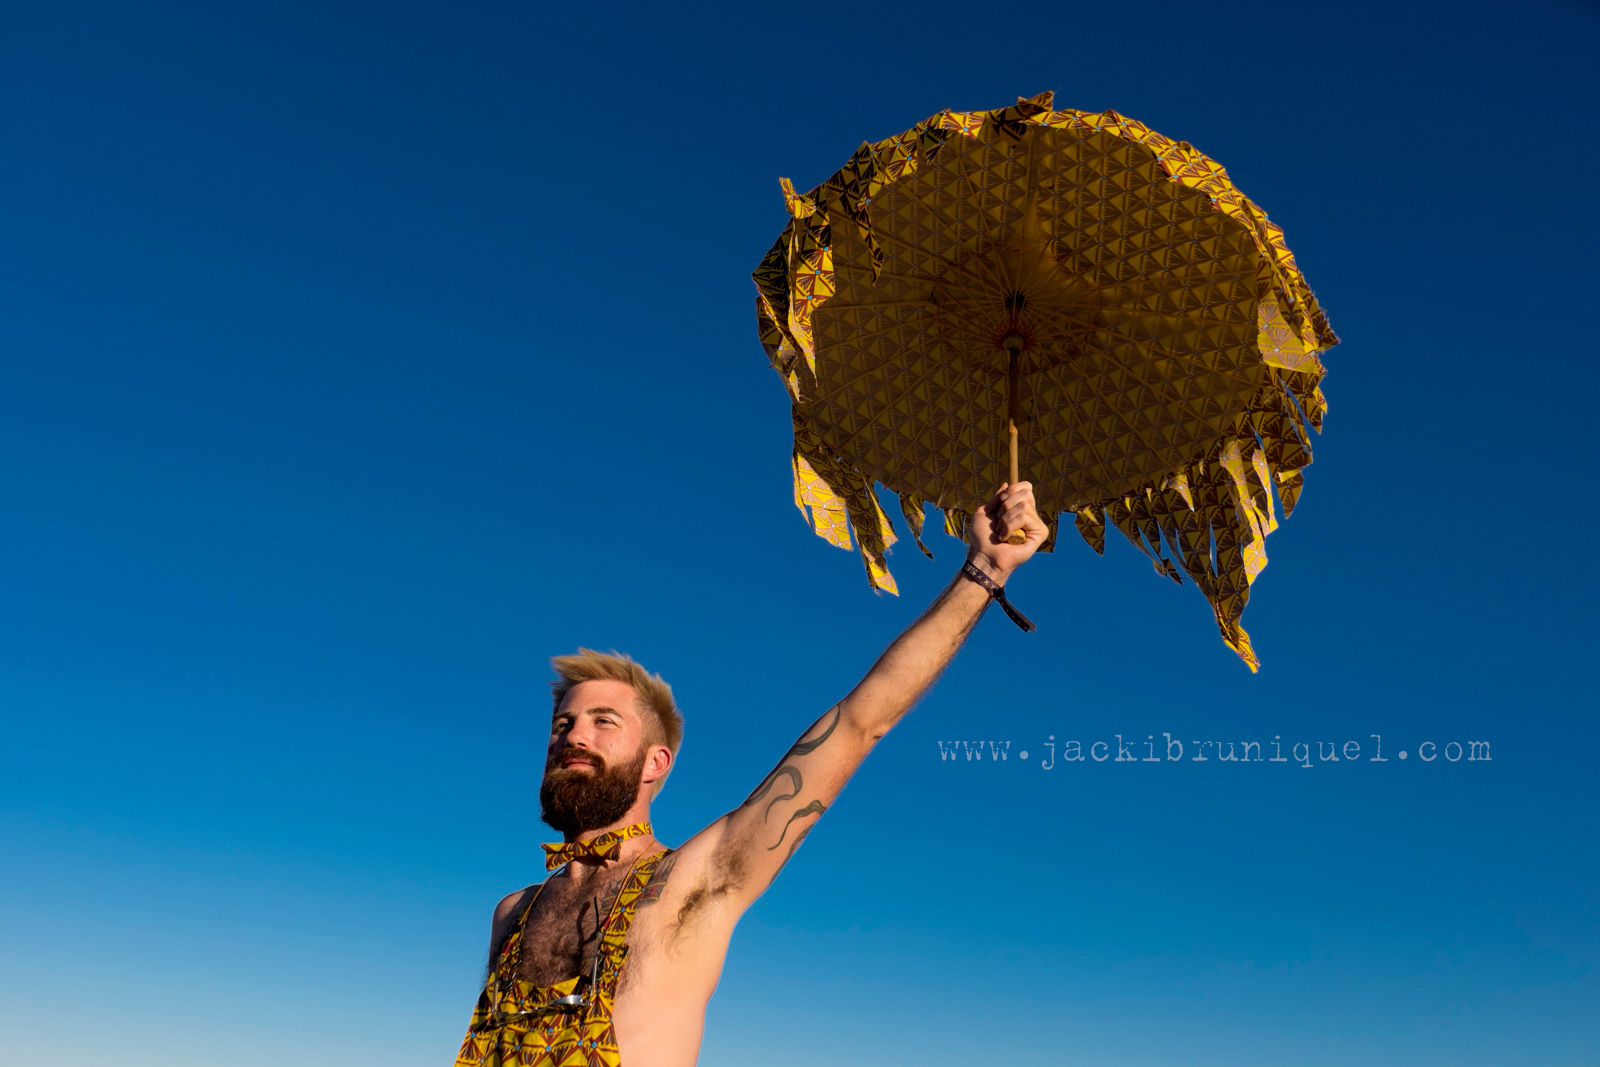 Afrika-Burn-2016-Creative-South-African-Photographer-Jacki-Bruniquel-022.jpg